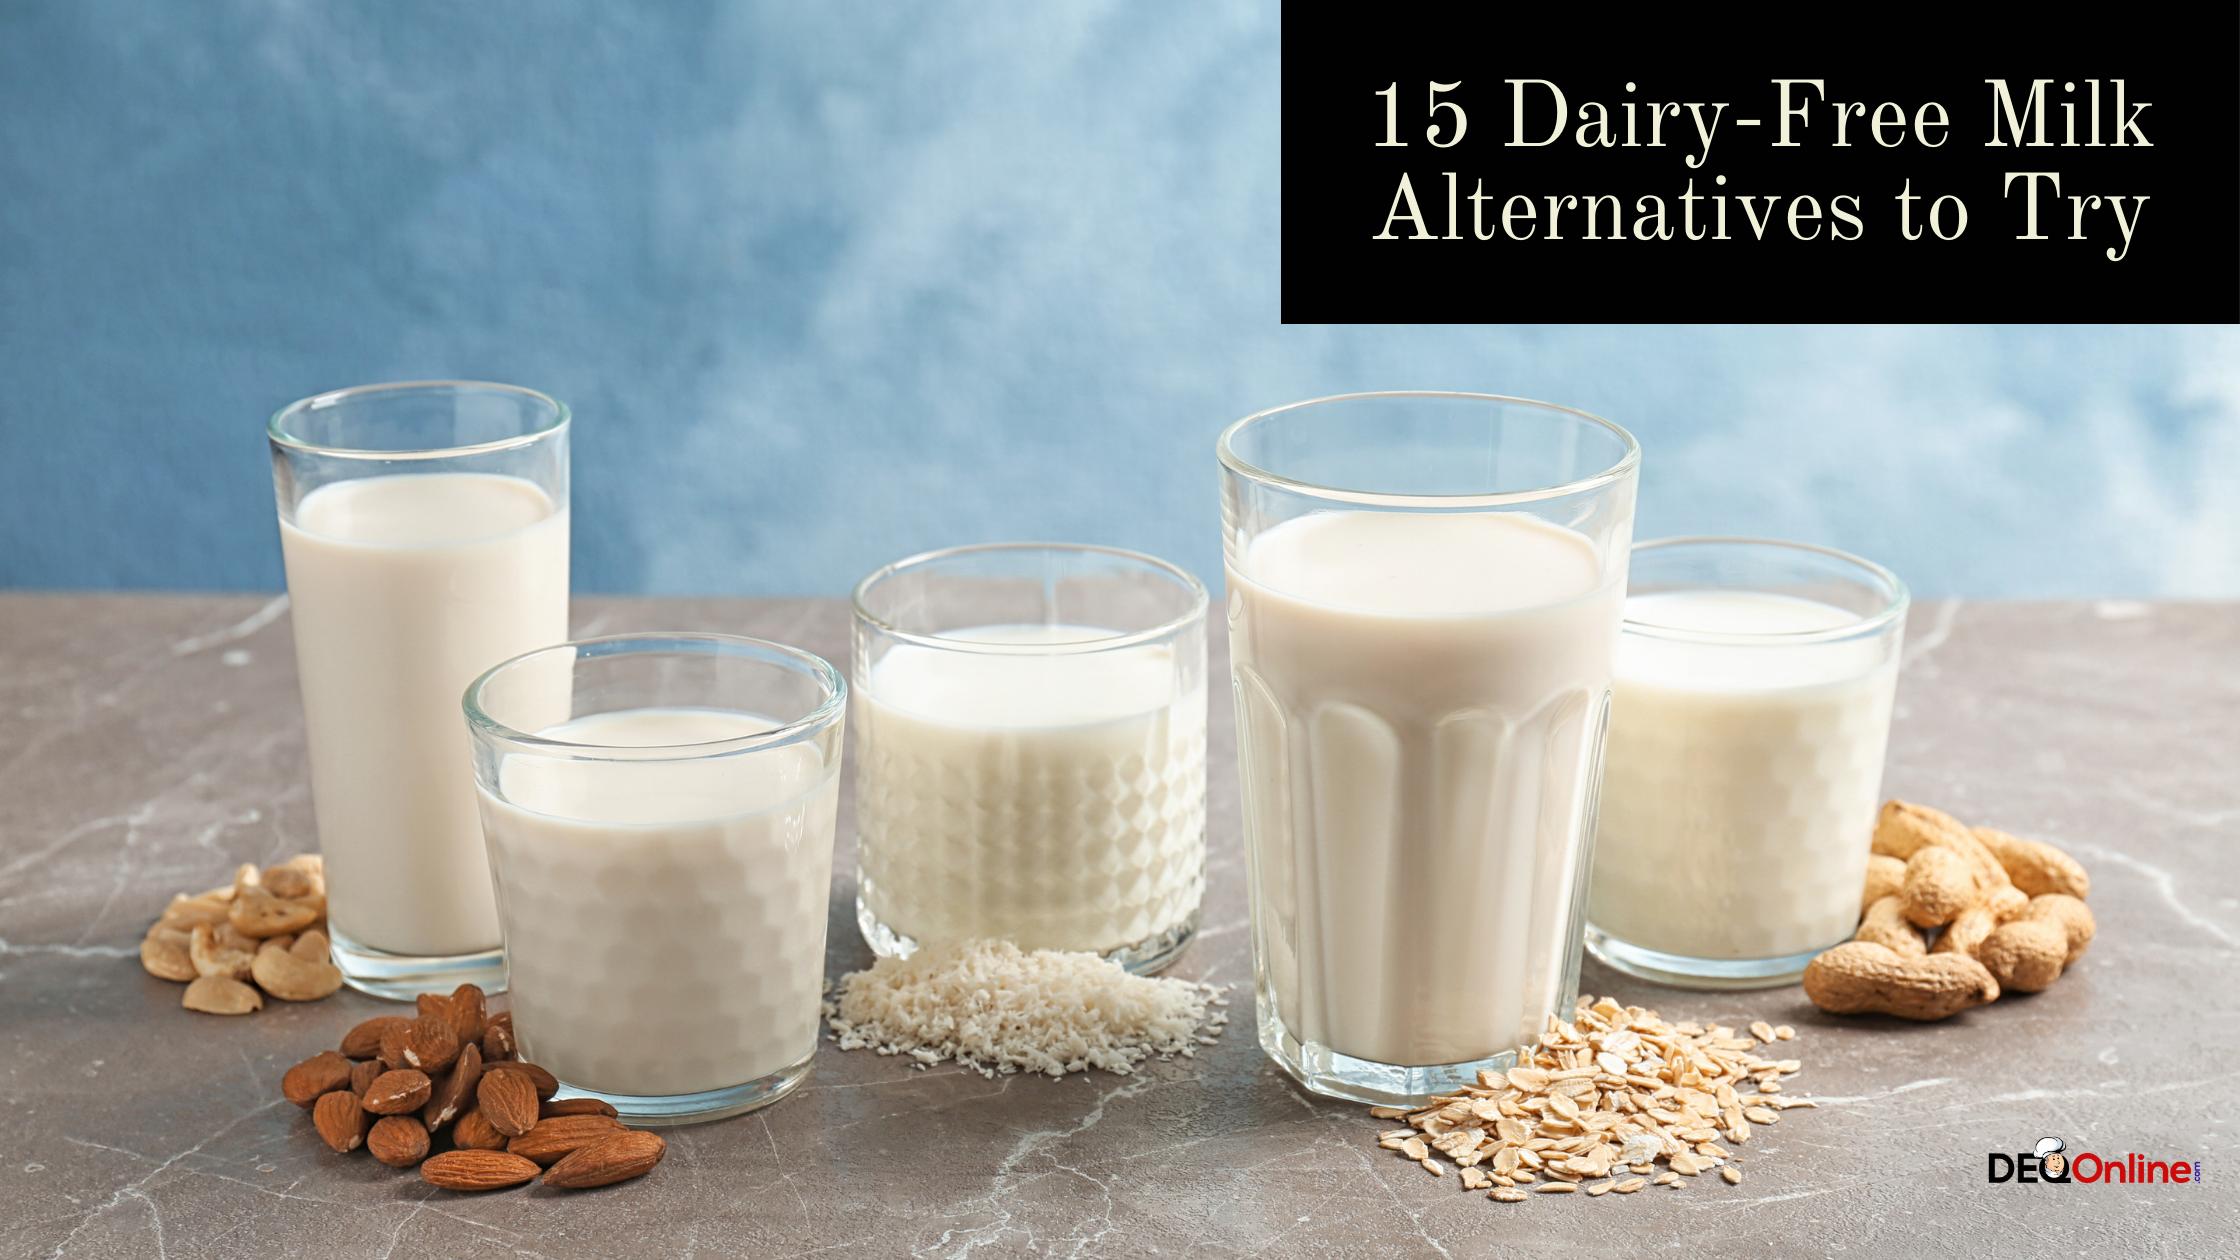 15 Dairy-Free Milk Alternatives to Try